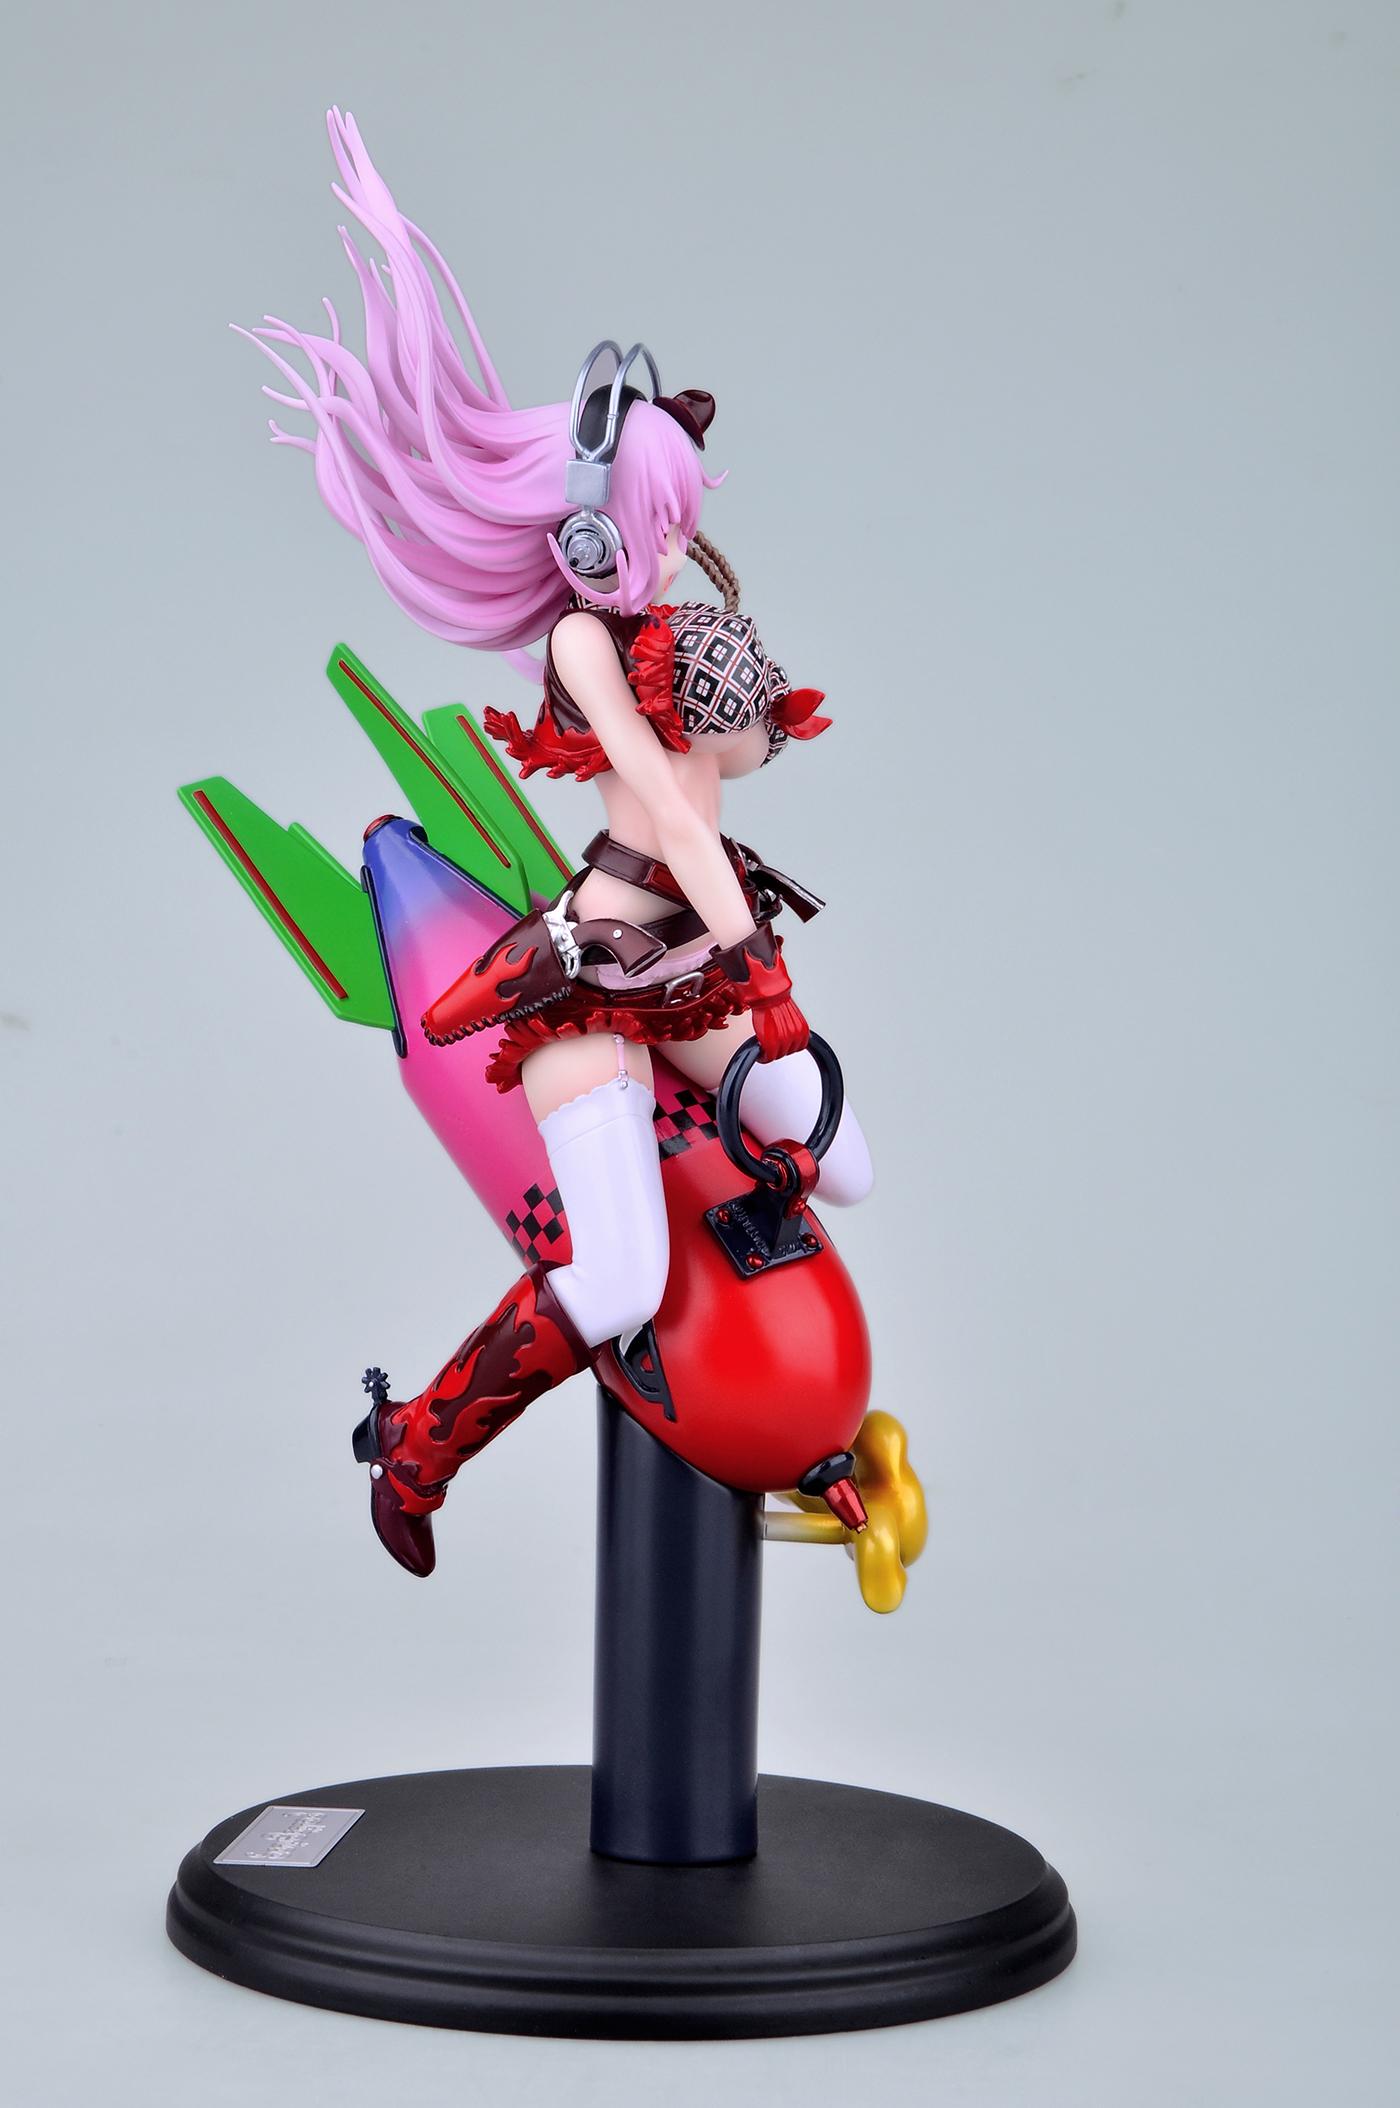 Nitroplus' Mascot Rides a Giant Rocket haruhichan.com Super Sonico rocket figure00